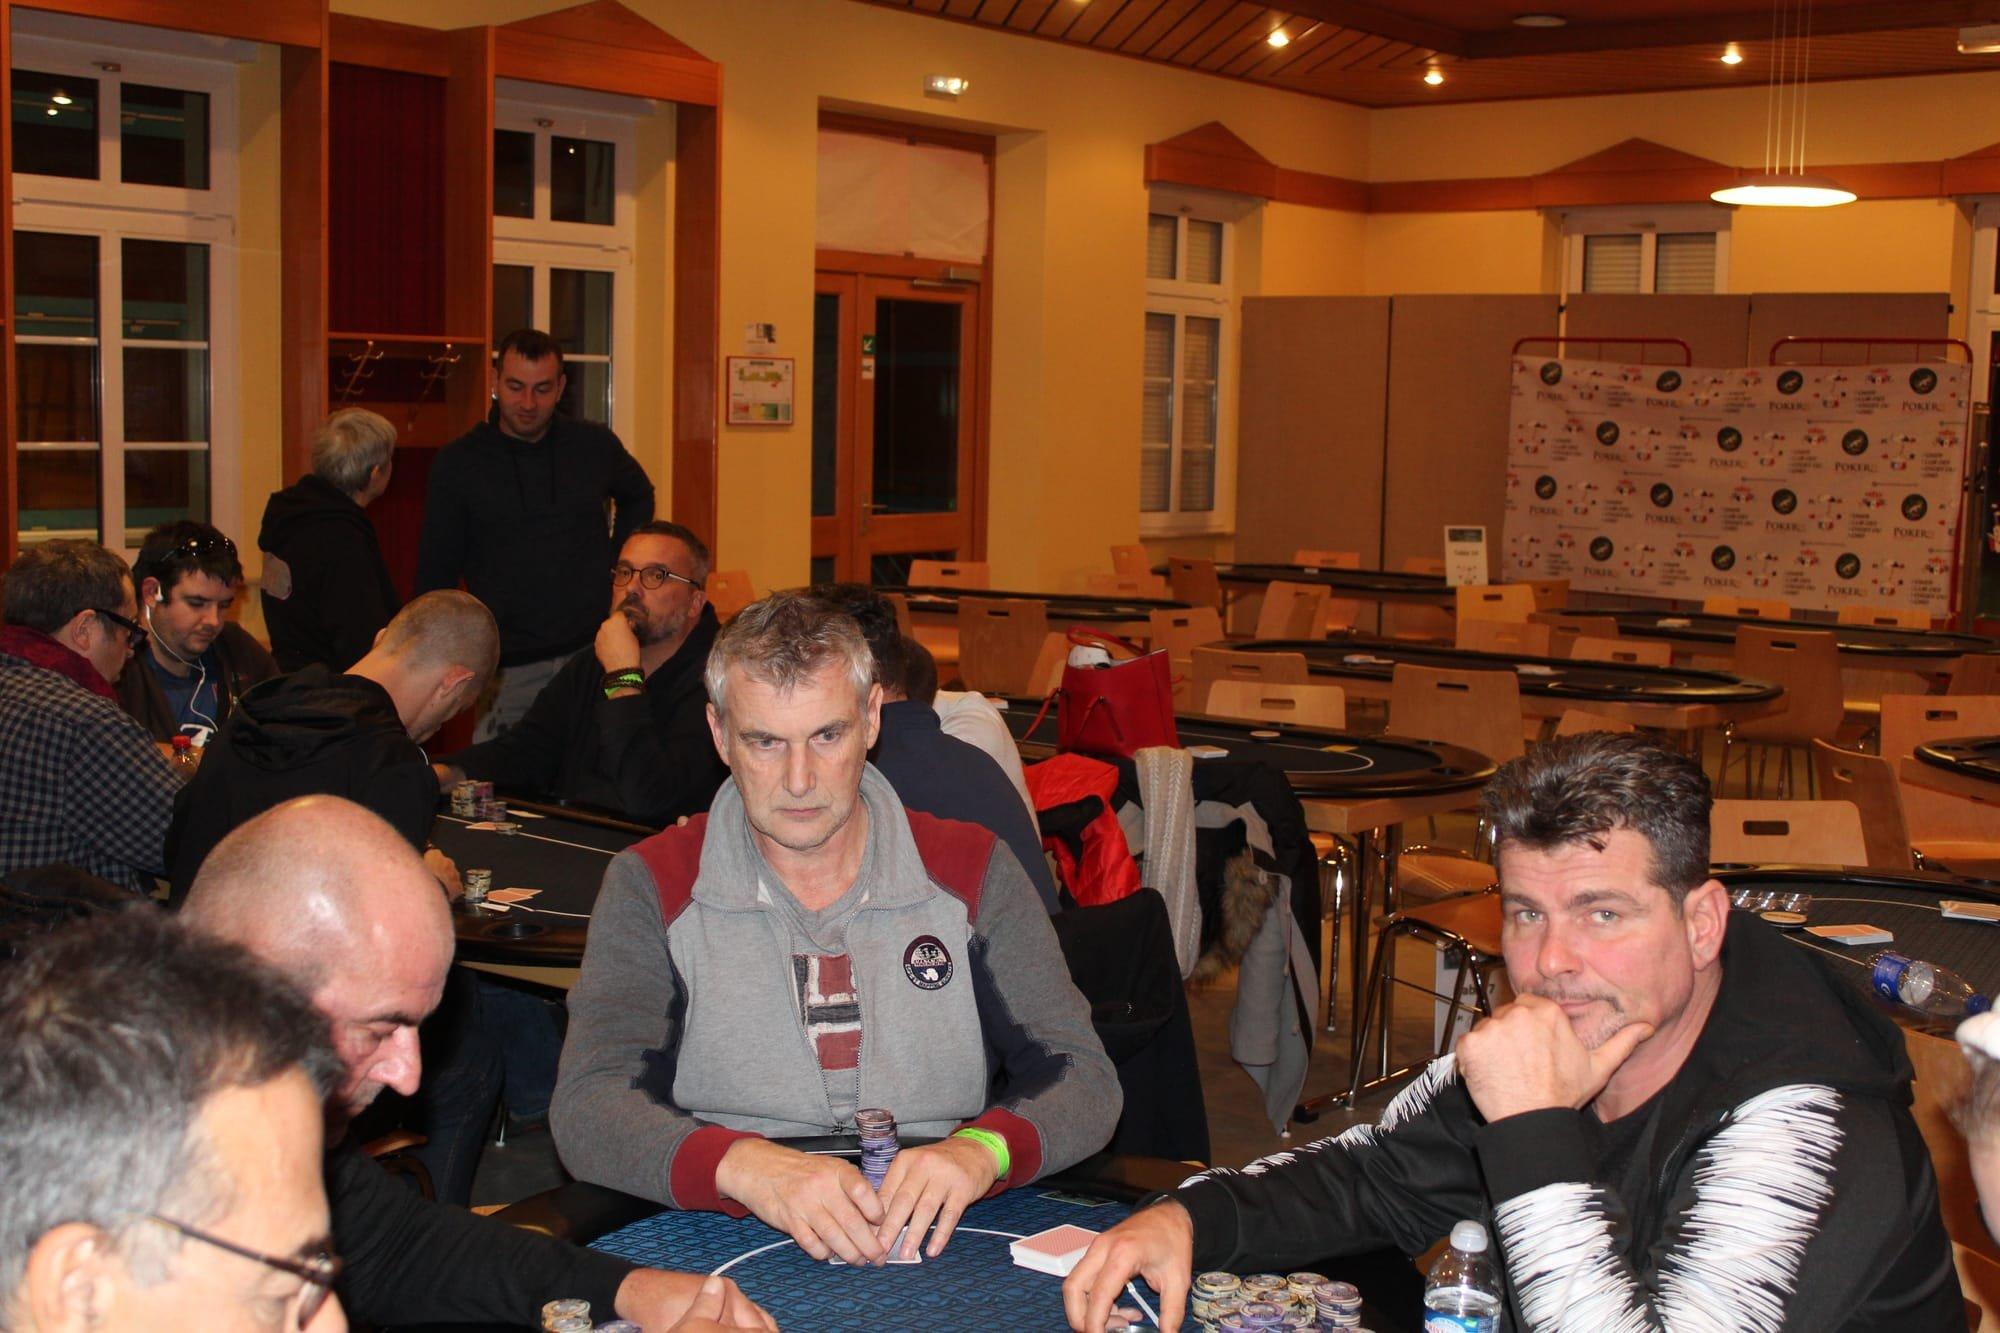 Pokerstars betting sports